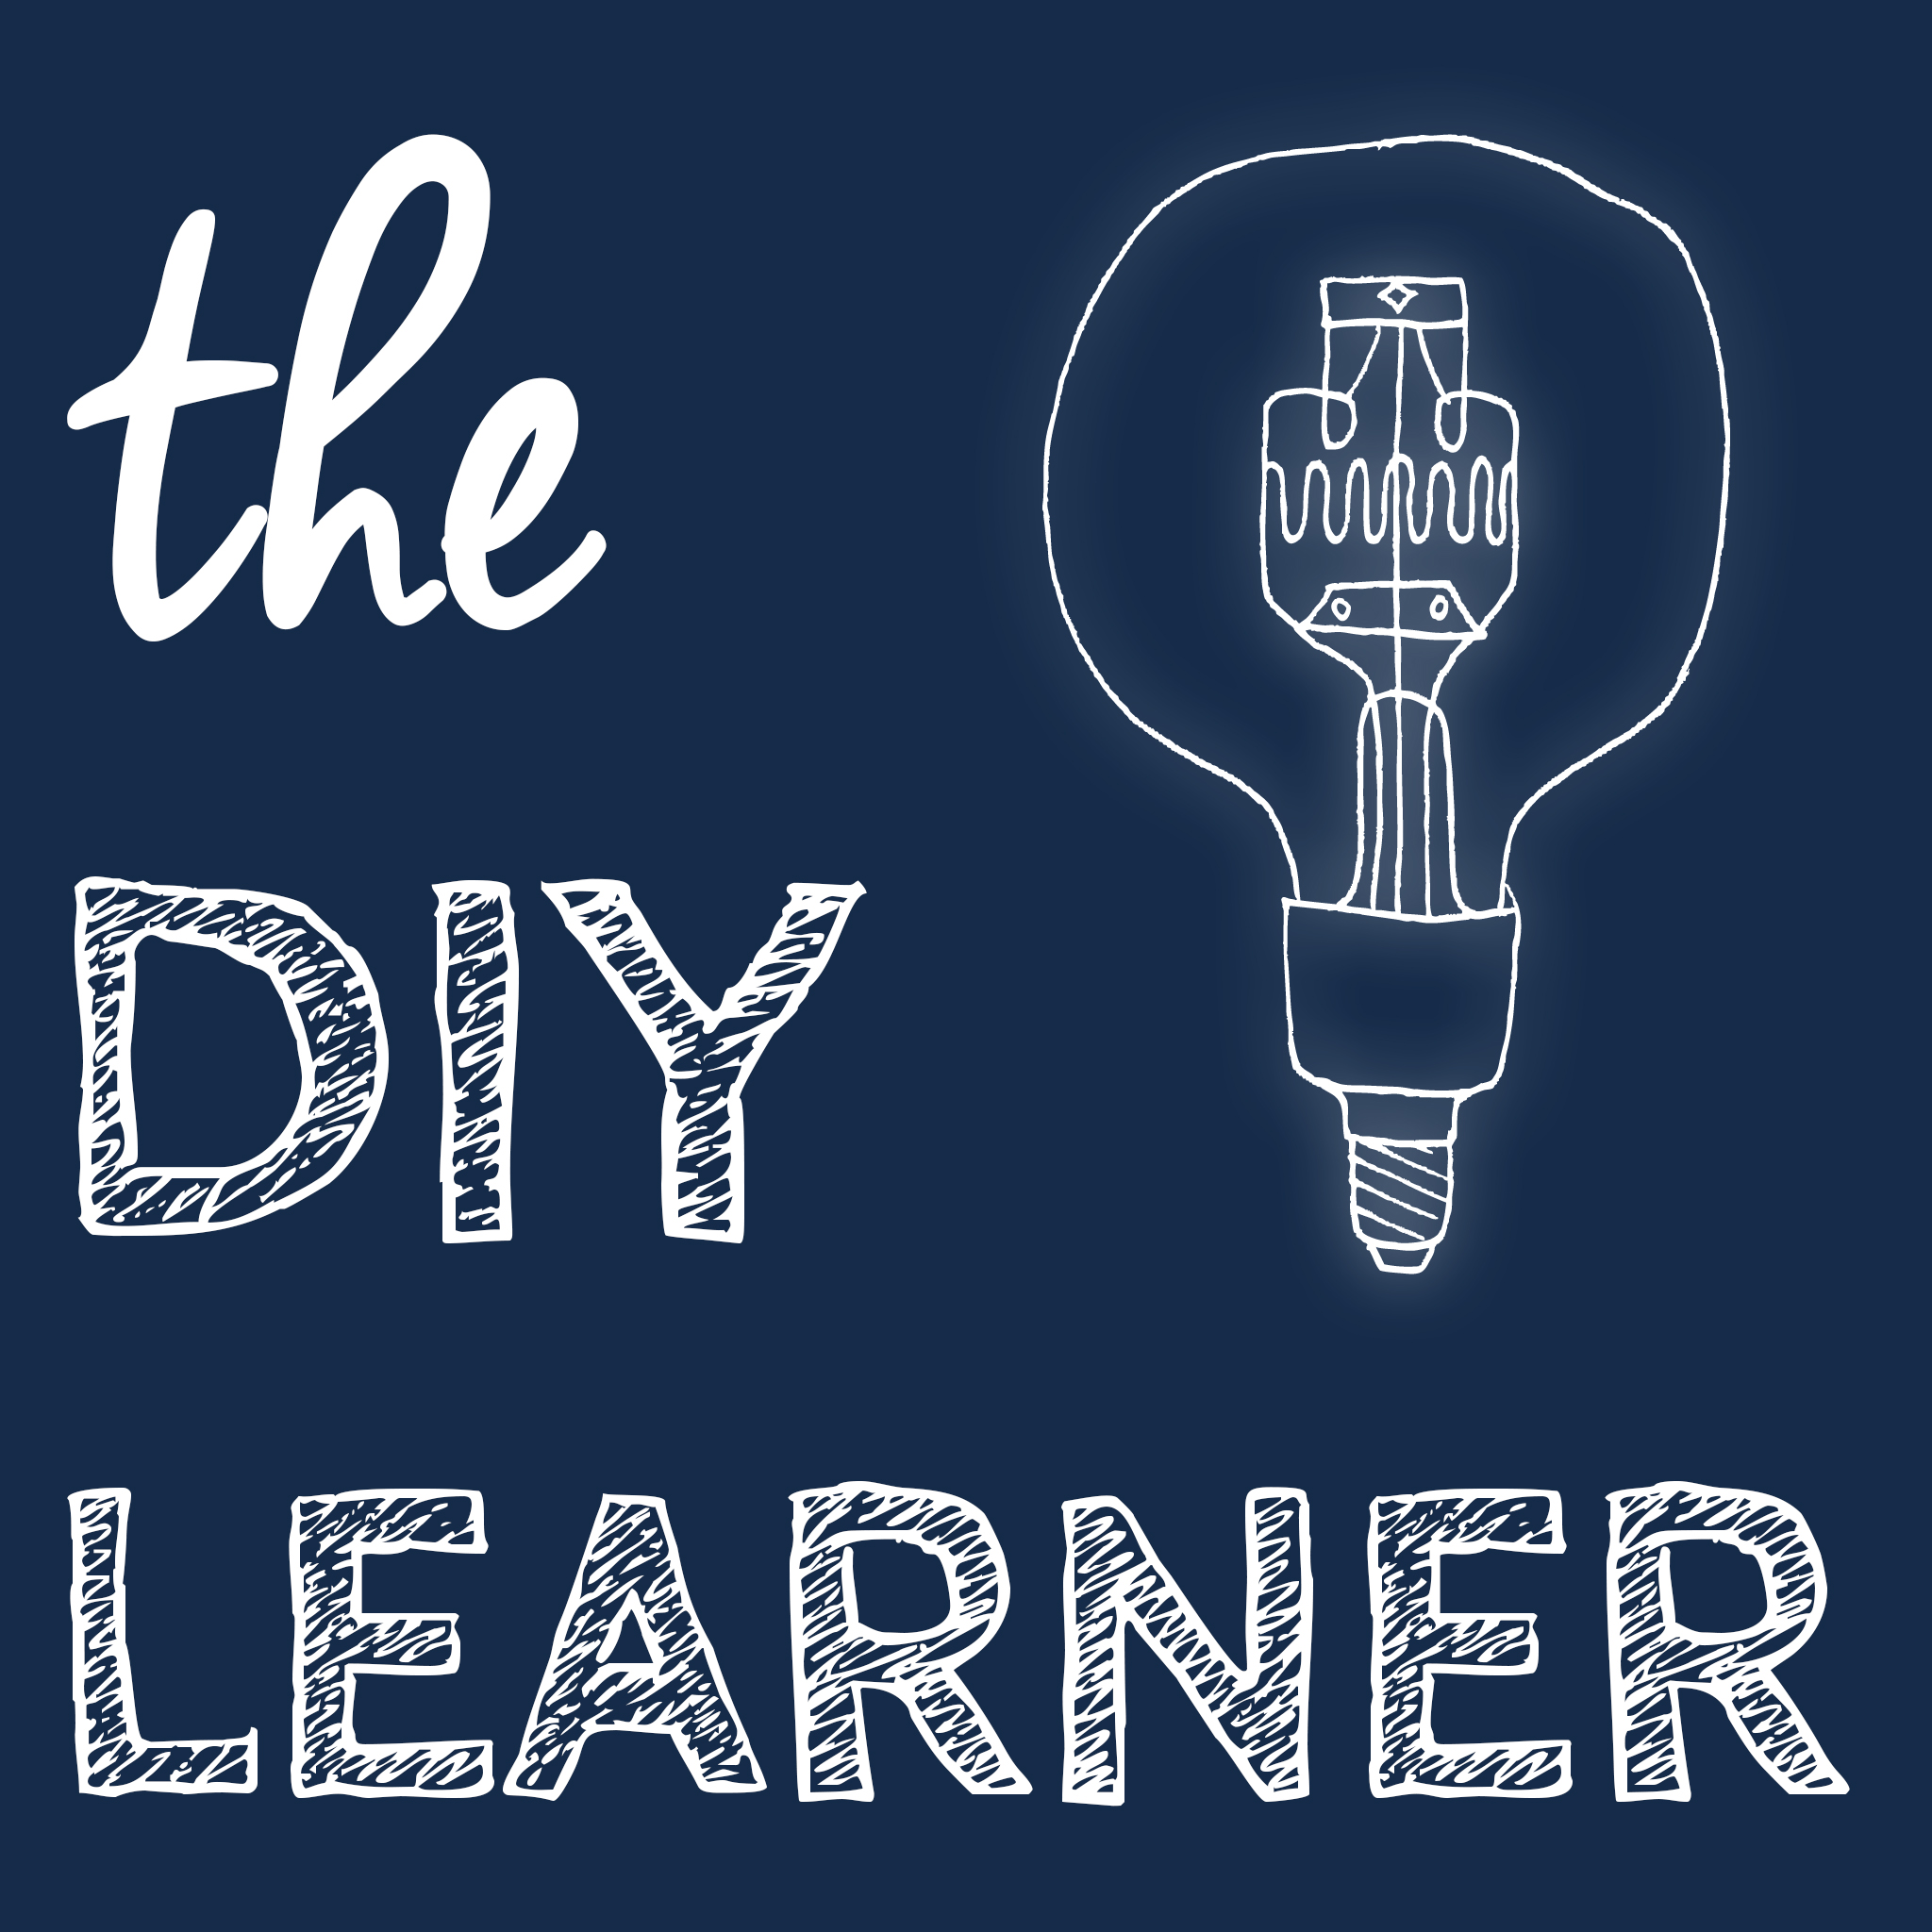 The DIY Learner